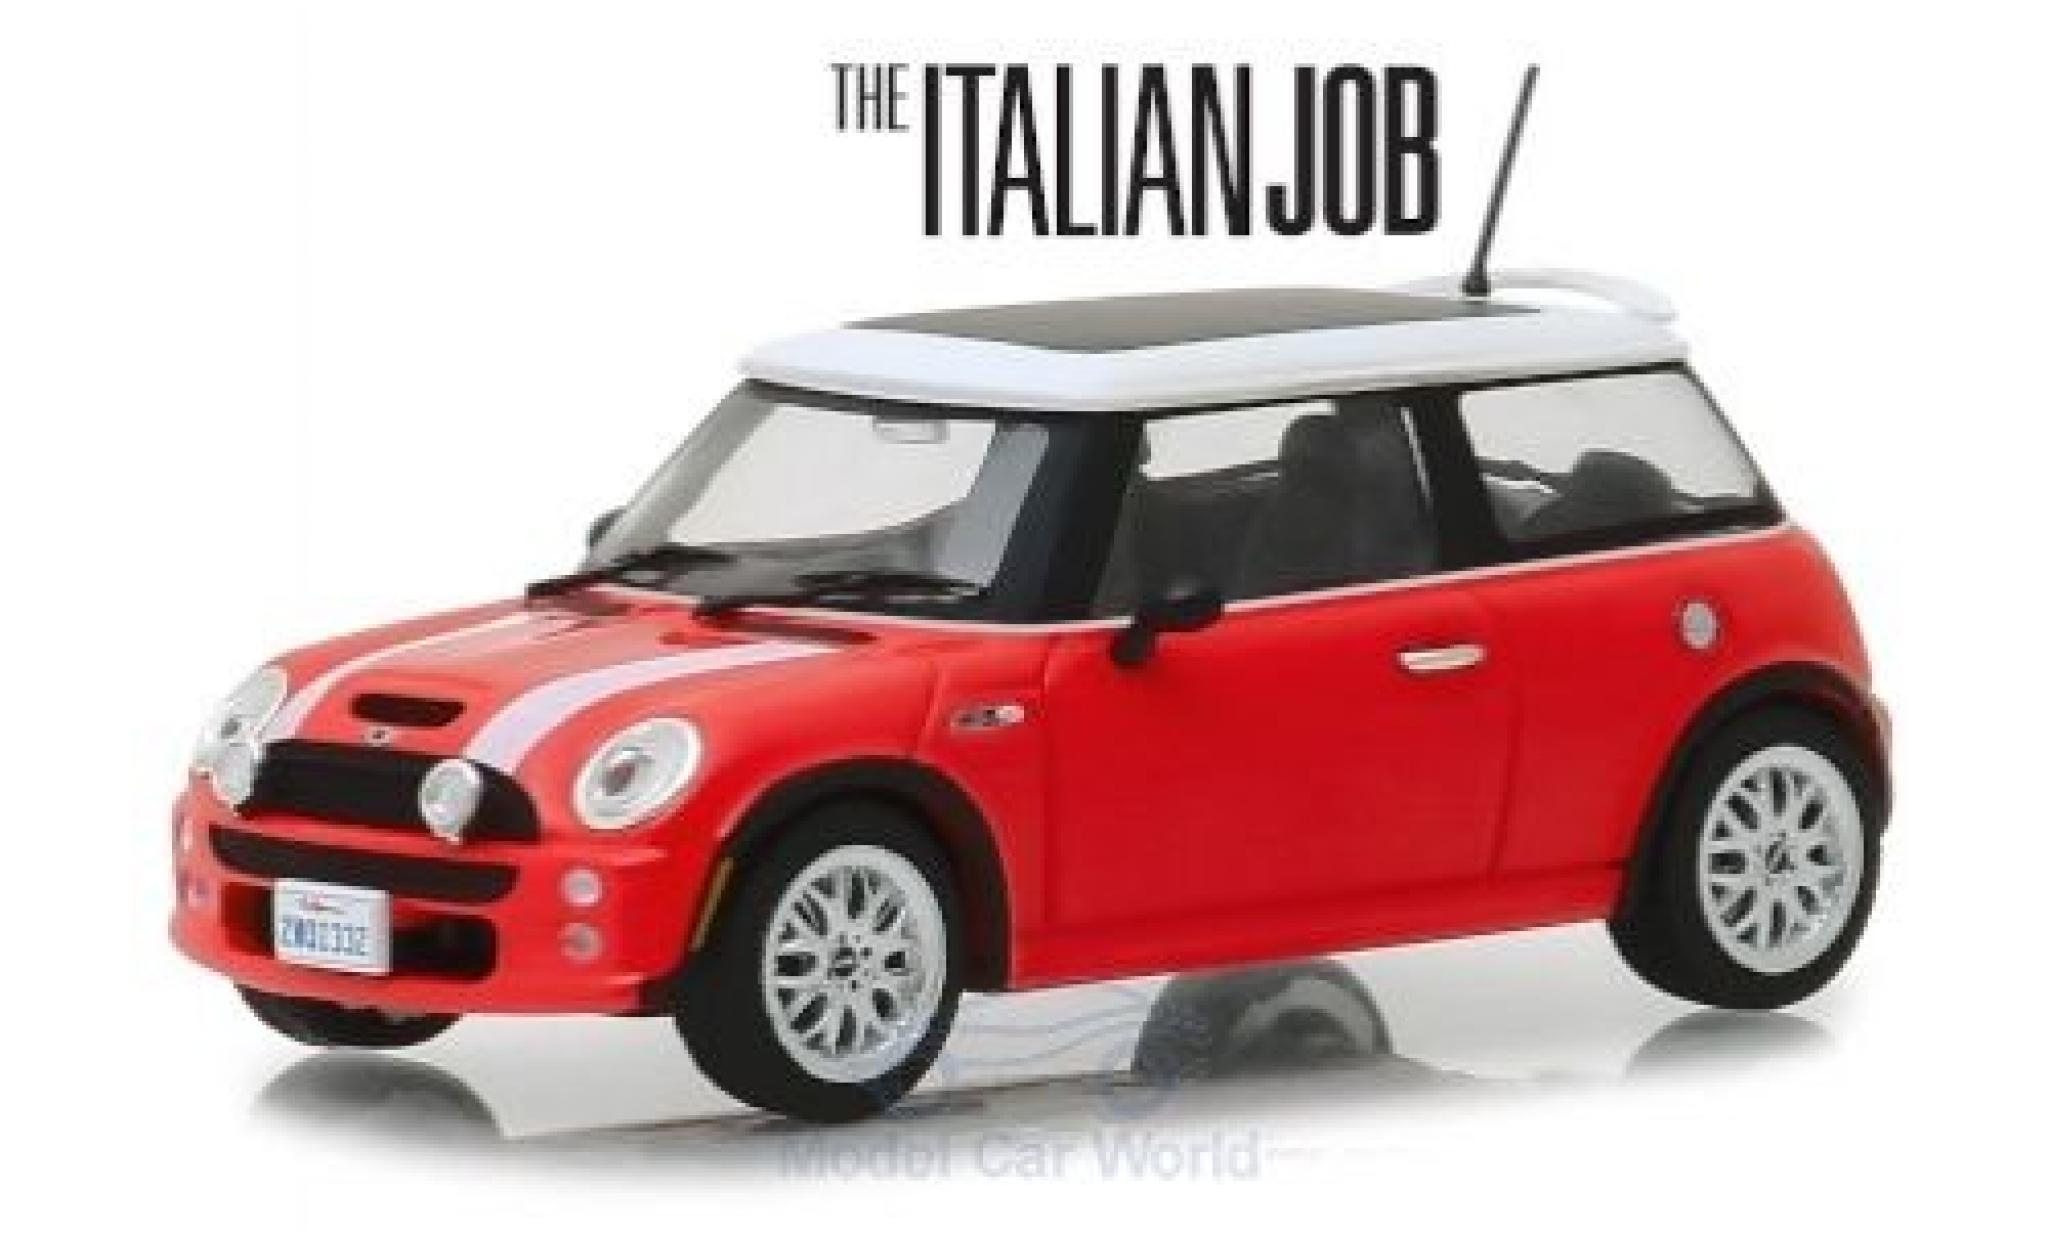 Mini Cooper 1/43 Greenlight S rouge/blanche RHD The Italian Job 2003